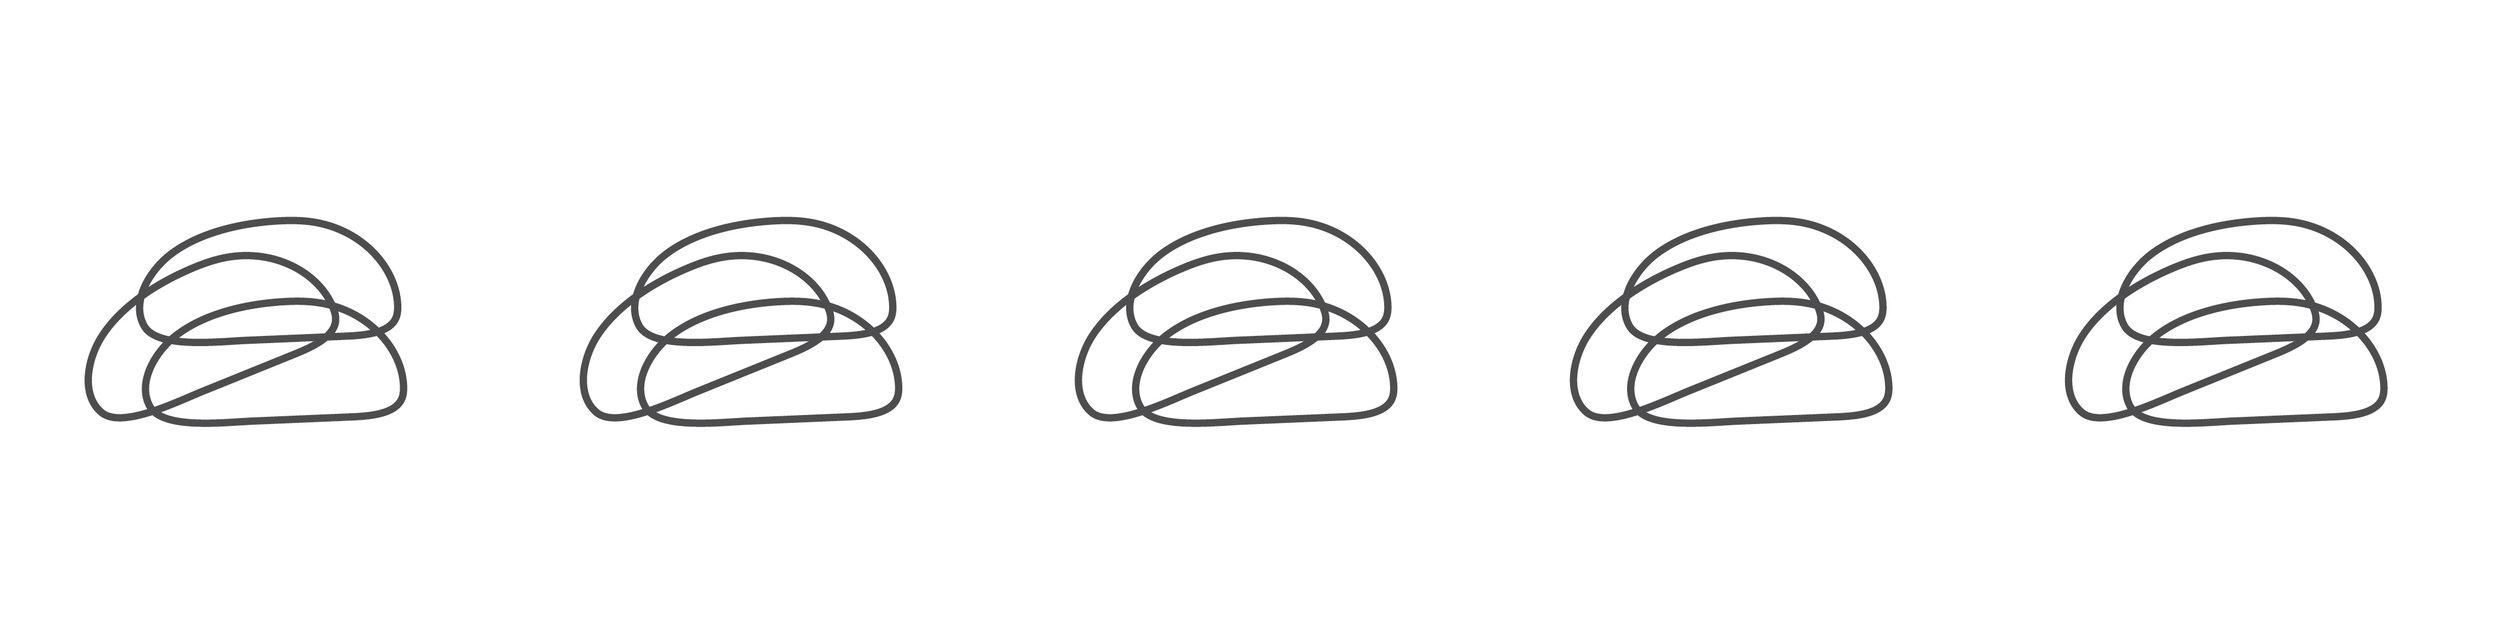 7 Layer Studio_LivBreads15.jpg